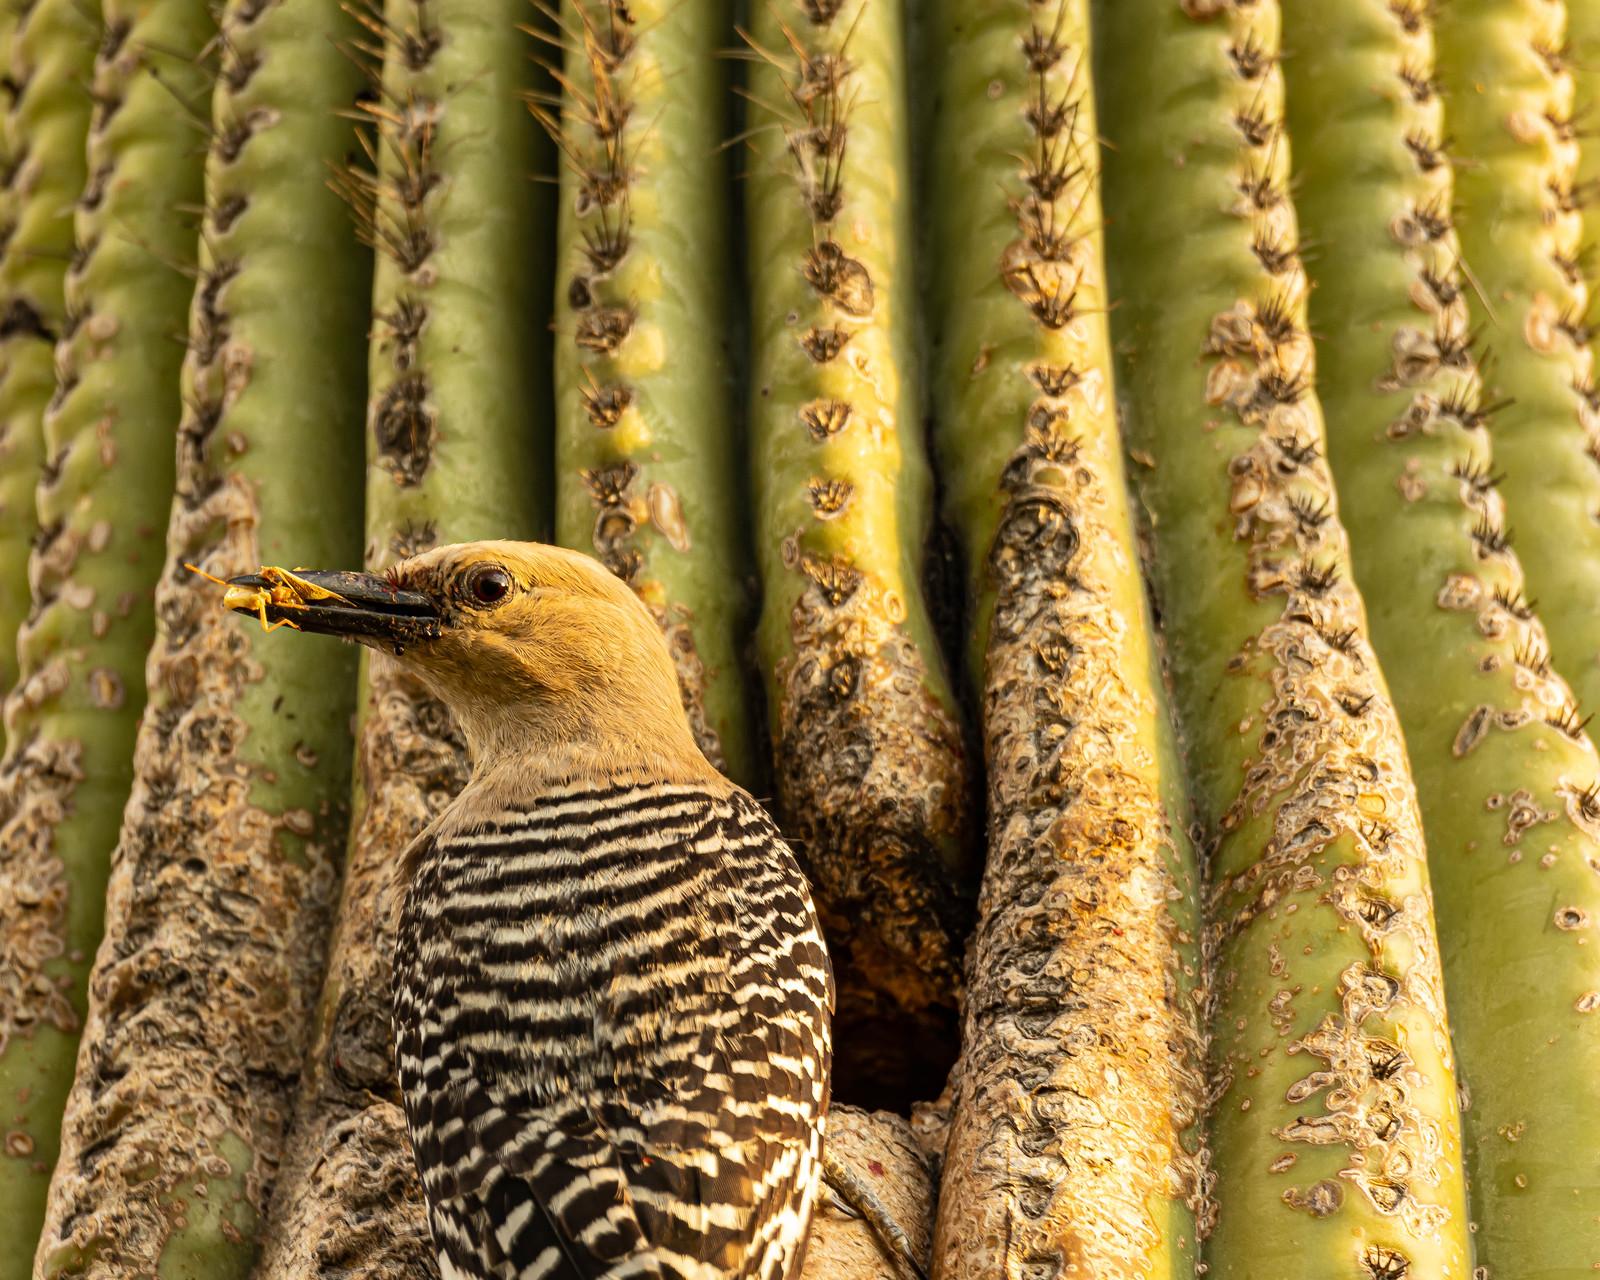 Woodpecker, Grasshopper, Cactus